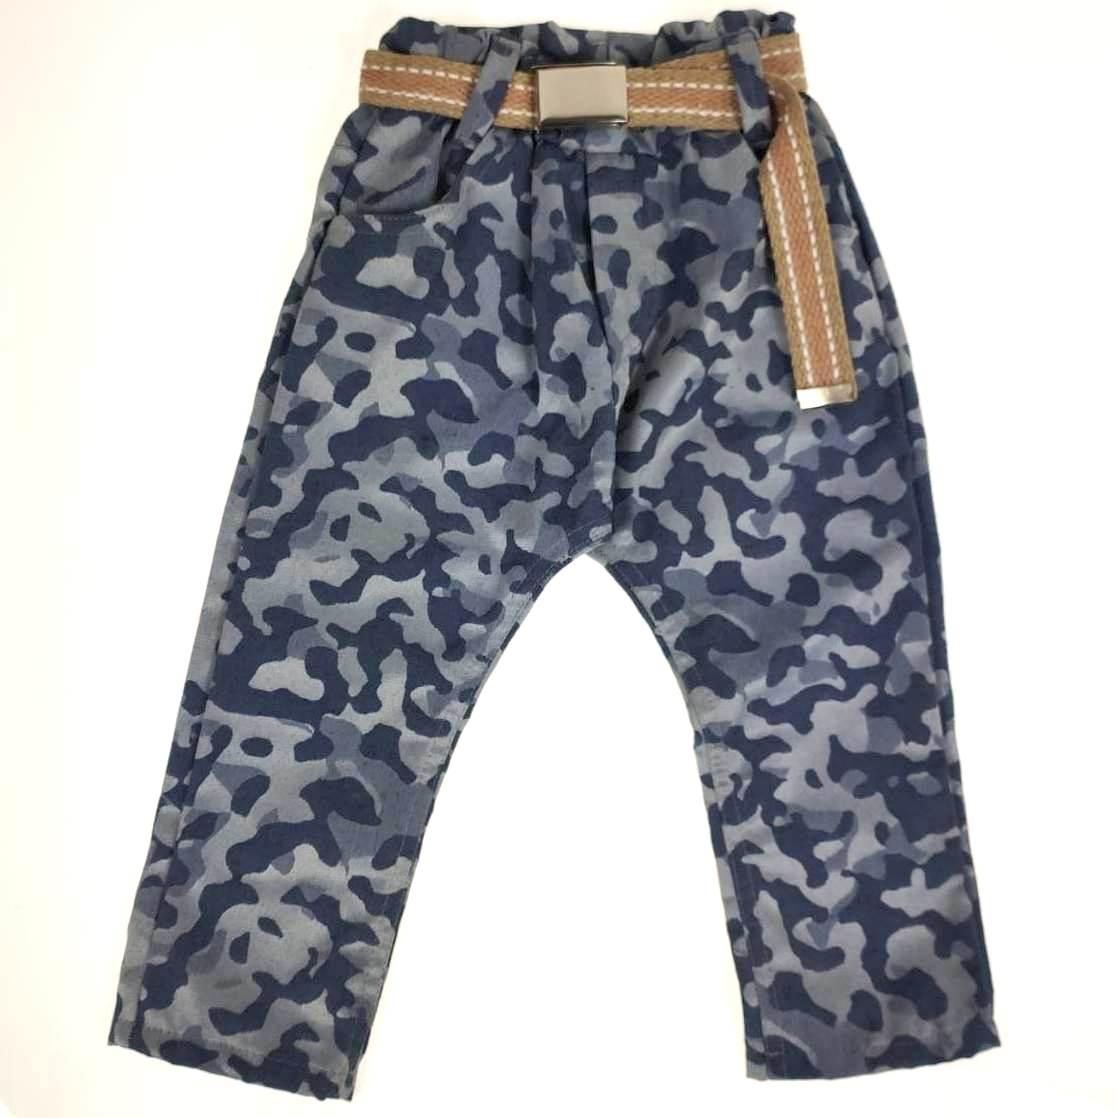 Calça Sarja Estampa Camuflada Azul com Cinto Kox